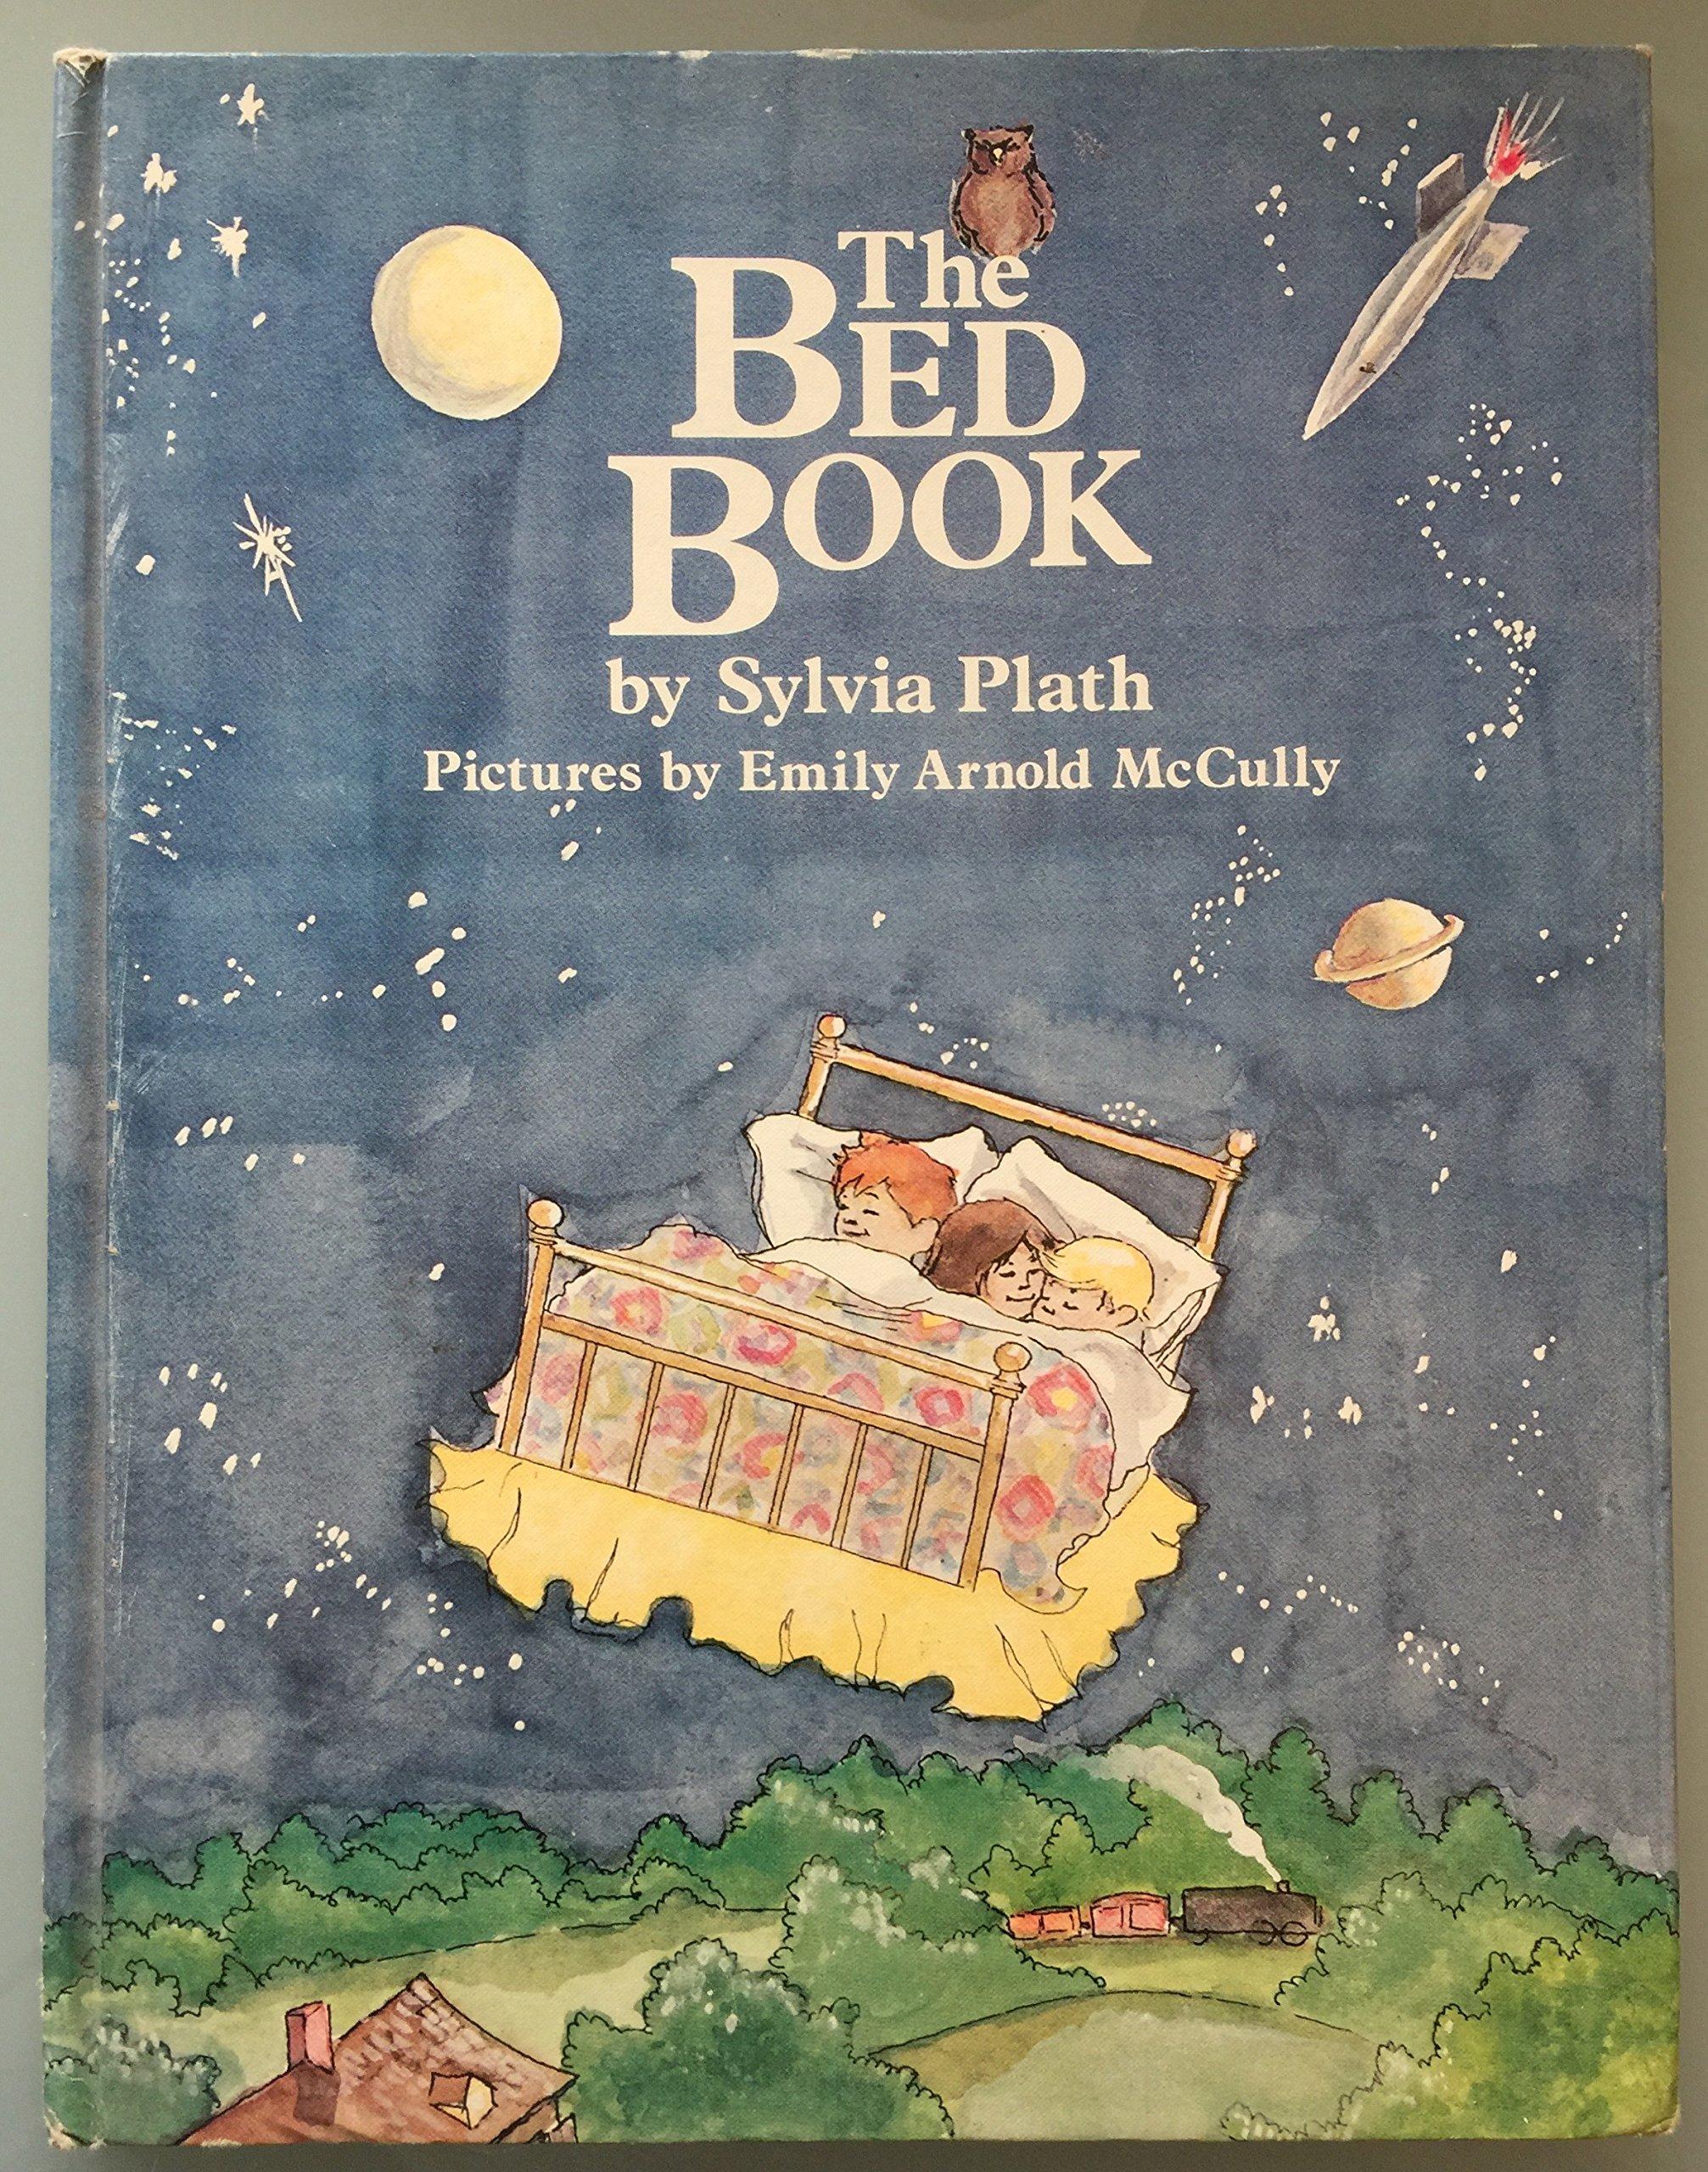 The bed book: Sylvia Plath, Emily Arnold McCully: 9780060247461:  Amazon.com: Books